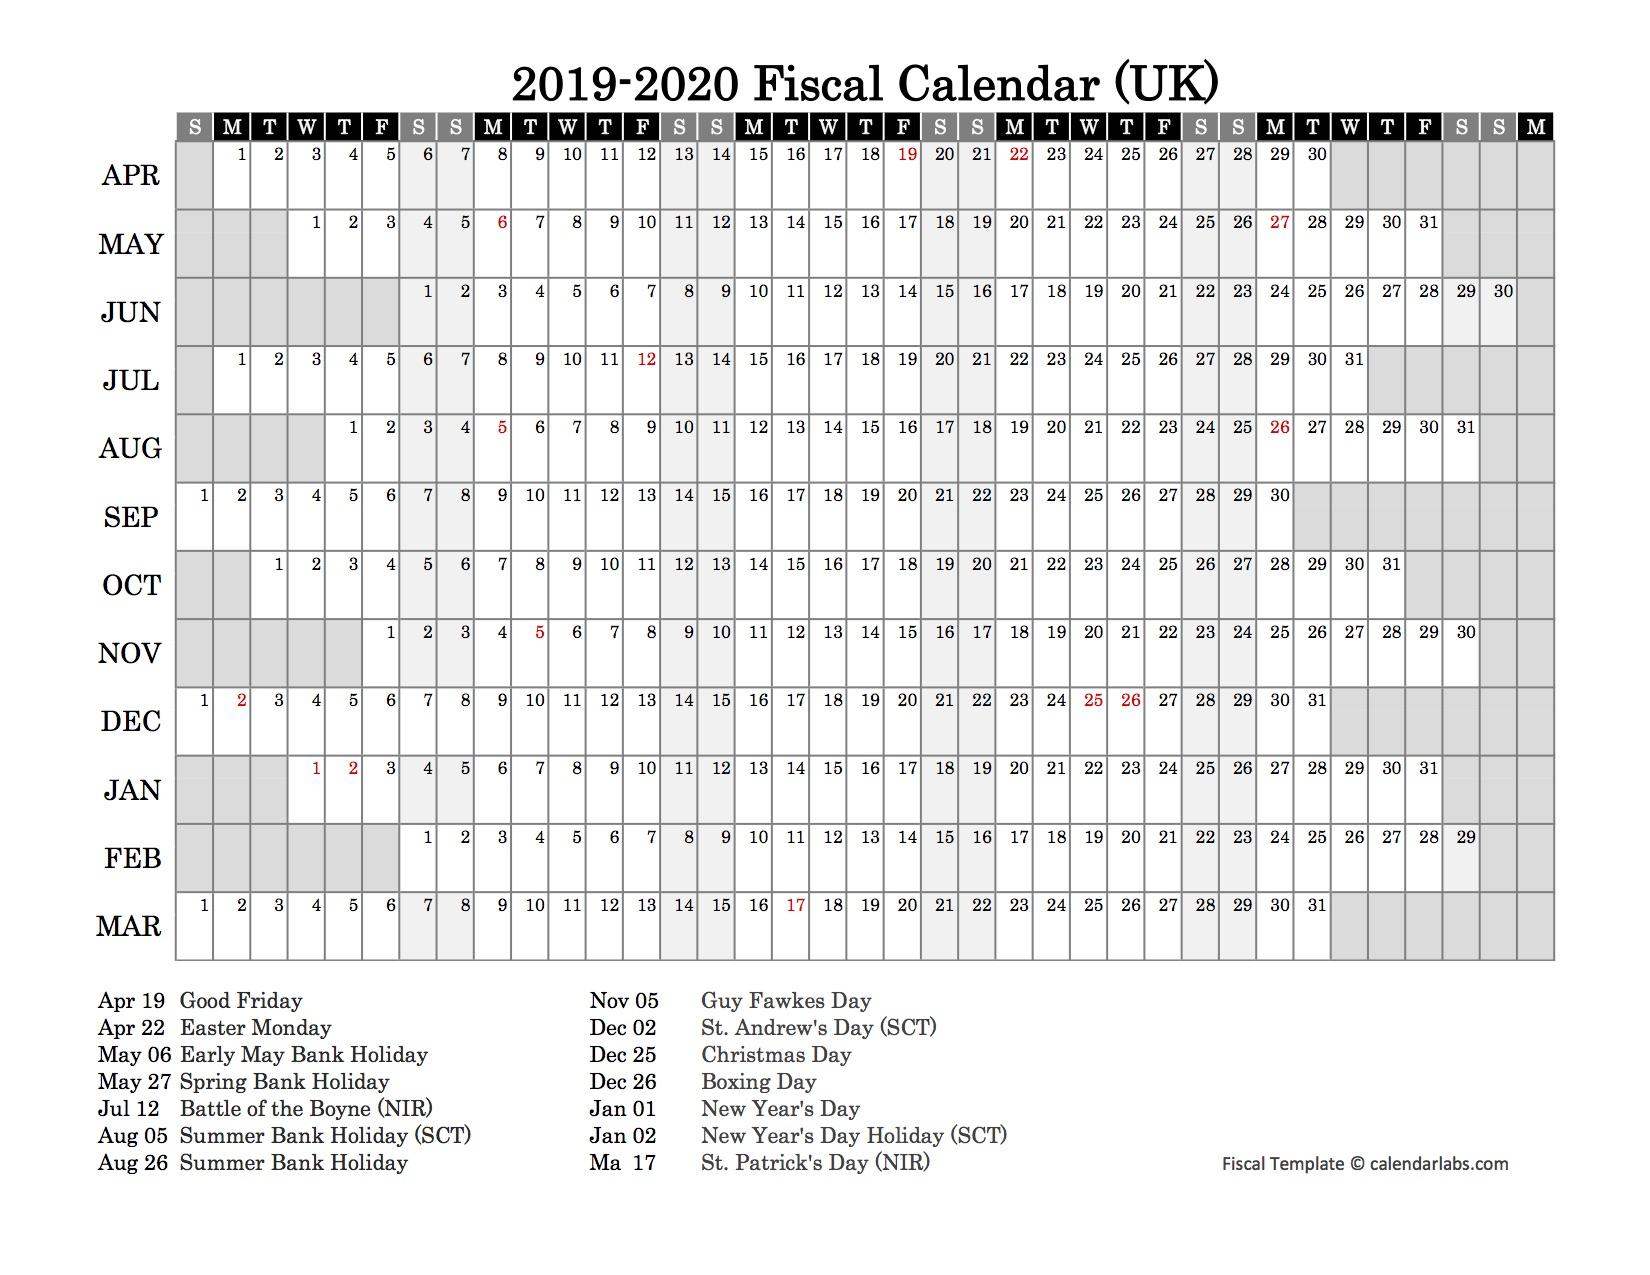 2019 Fiscal Year Calendar - Free Printable Templates